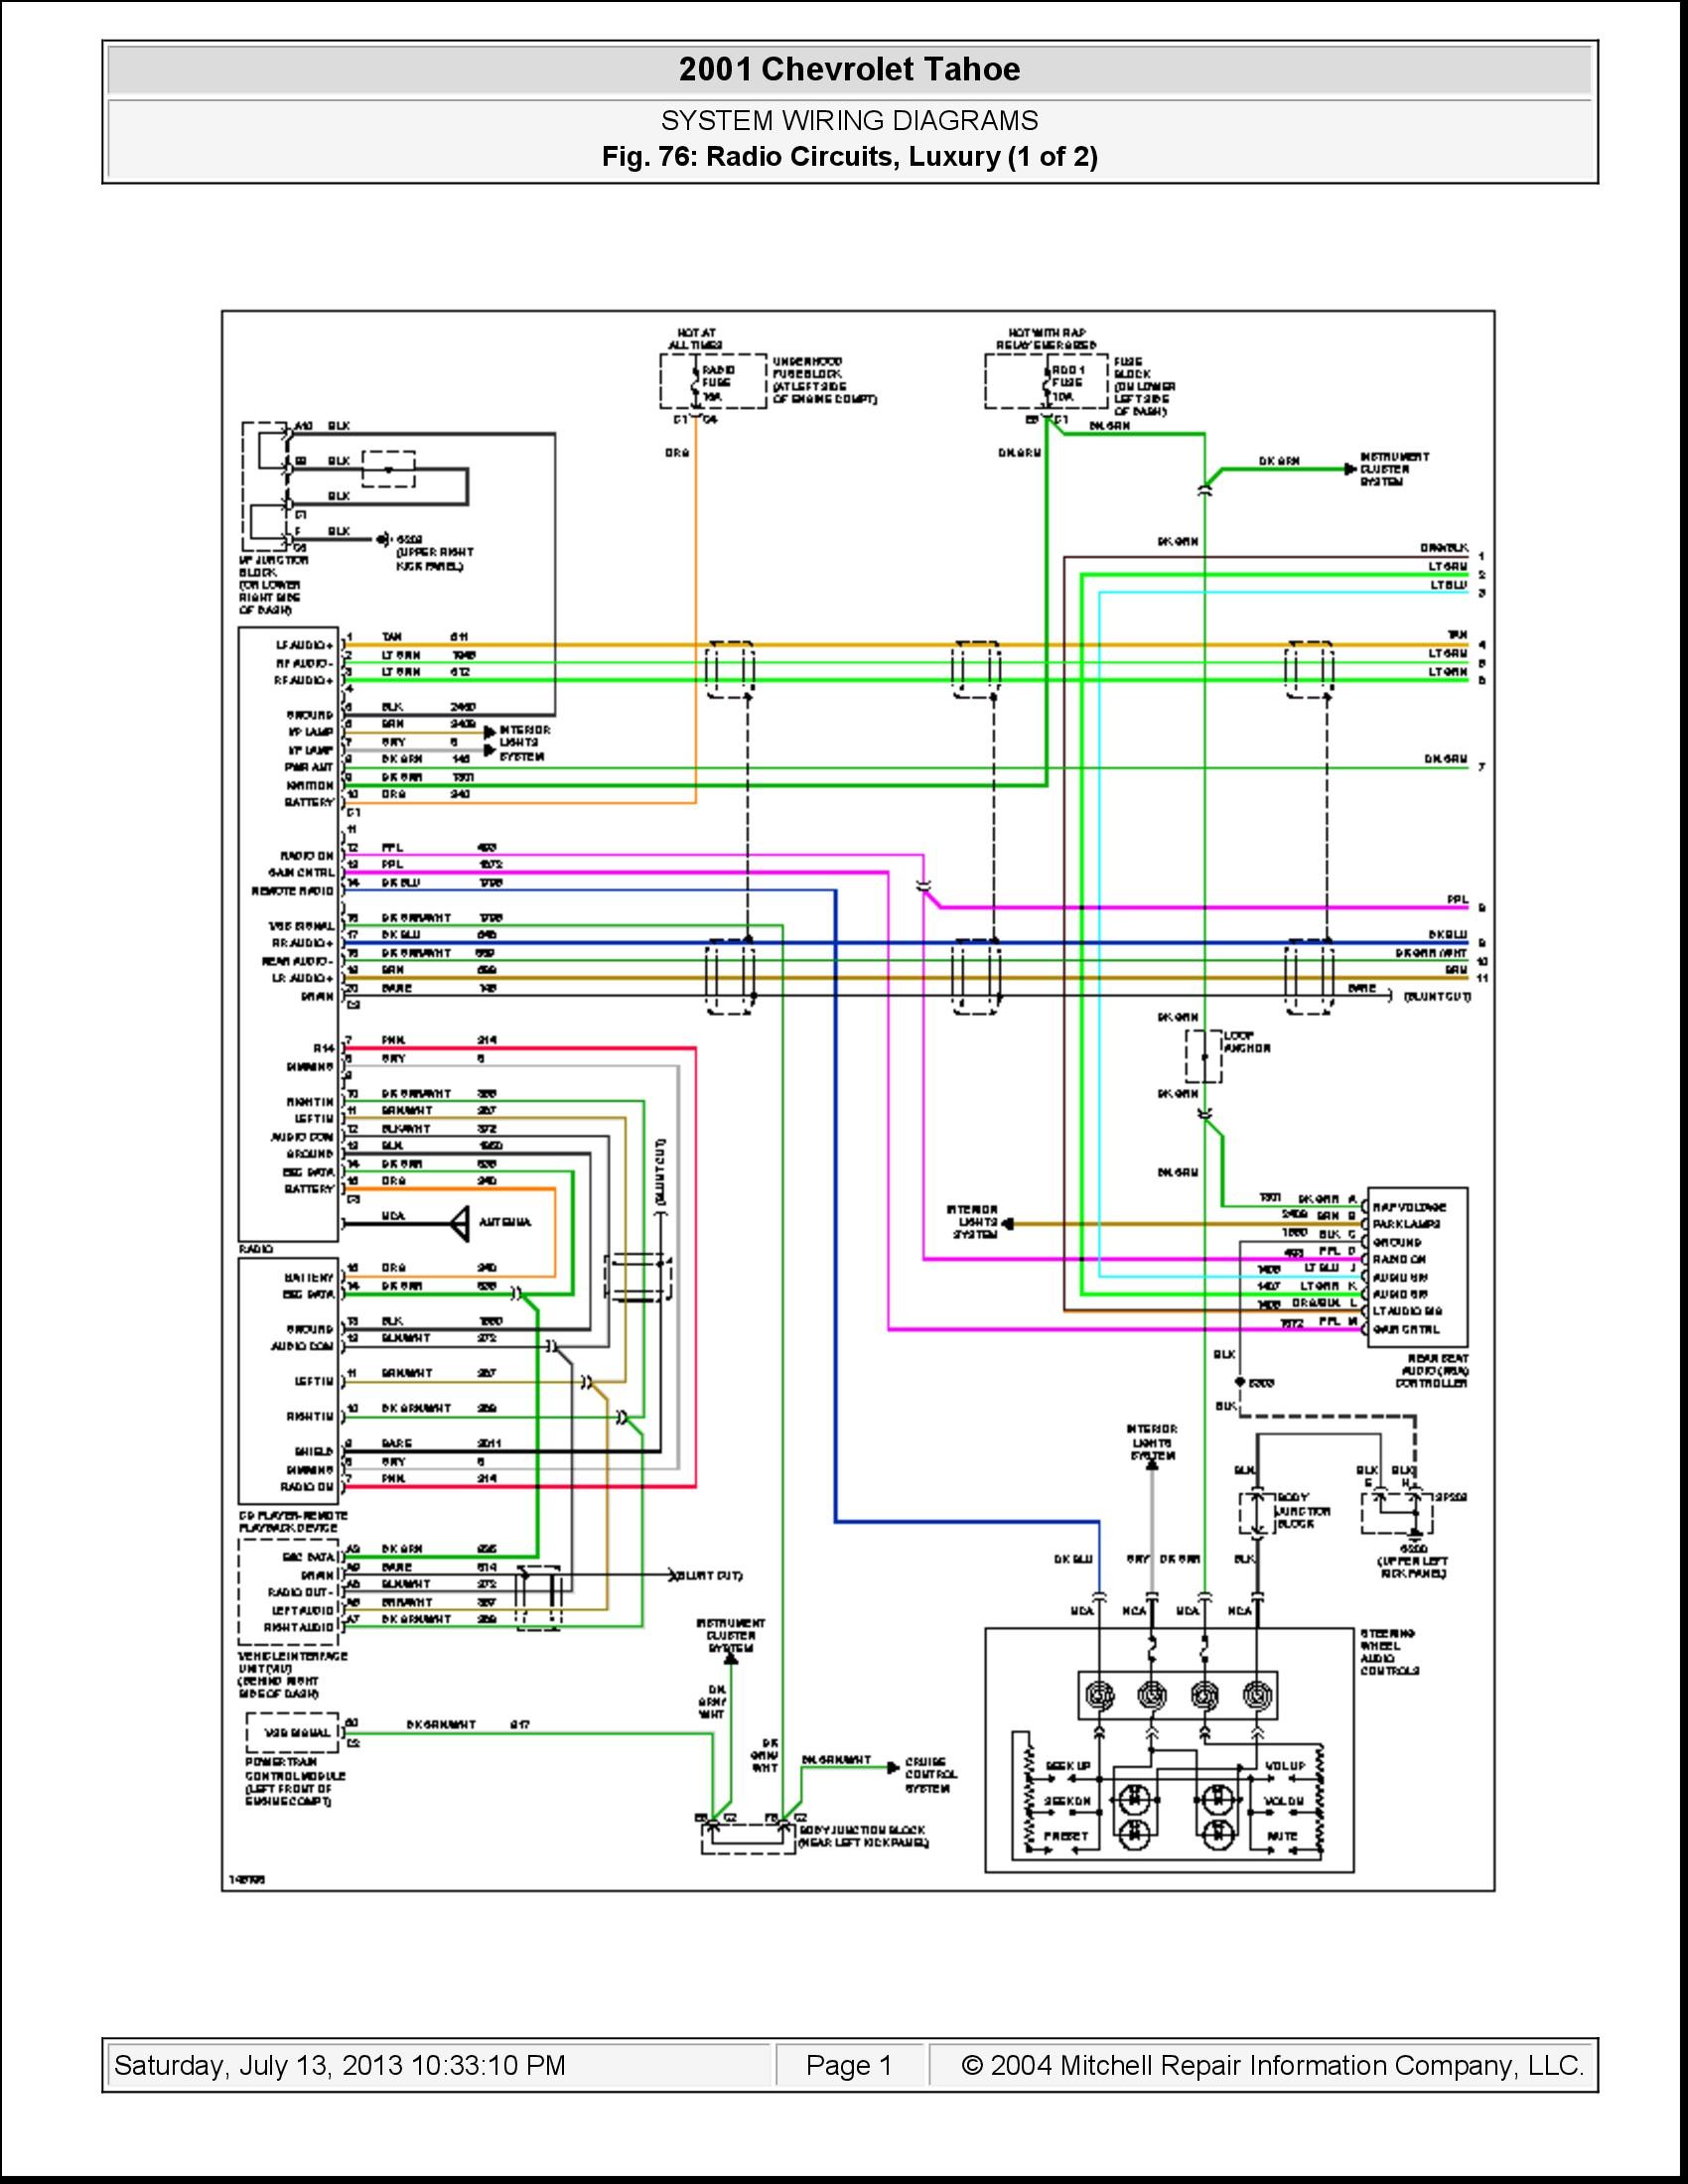 2004 Gmc Enbvoy Xuv Rear Tailgate Electrical Wiring Diagram 2010 Suburban Wiring Diagram Kenworth W900 Fuse Panel Of 2004 Gmc Enbvoy Xuv Rear Tailgate Electrical Wiring Diagram